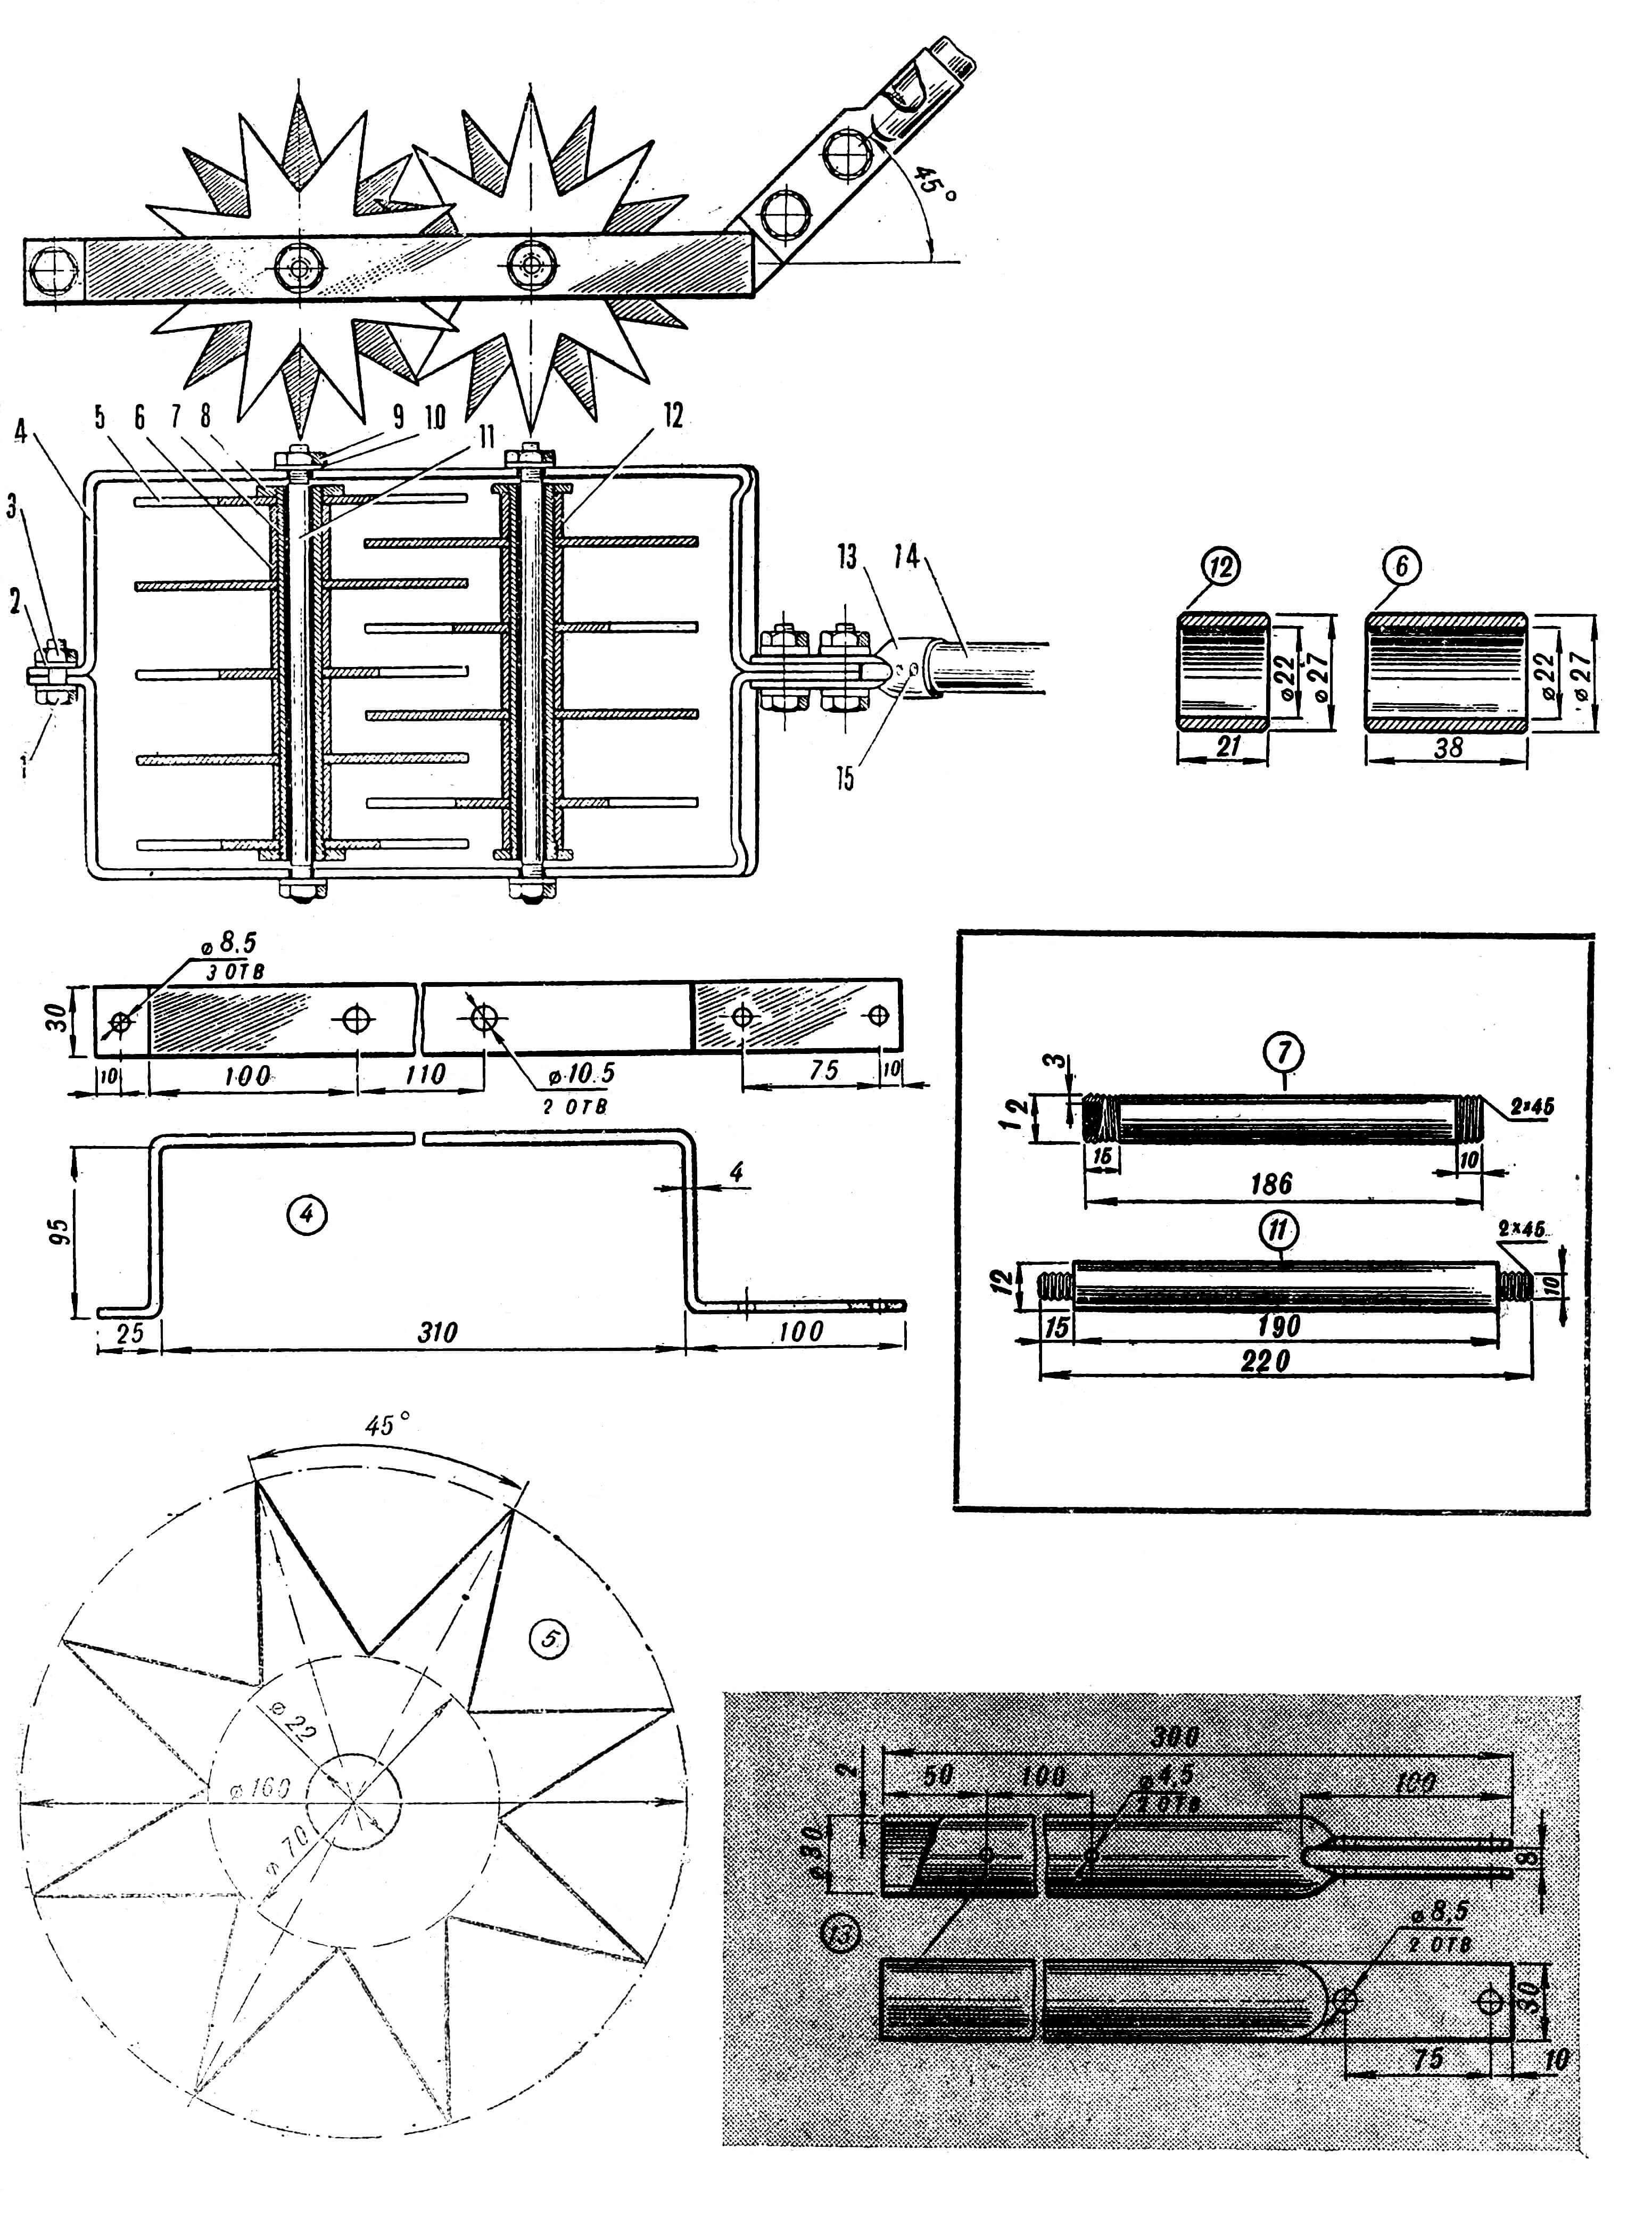 Общий вид и детали культиватора: 1 - болт М8х20 - 3шт.; 2 - шайба пружинная - 3 шт.; 3 - гайка М8 - 3 шт.; 4 - скоба - 2 шт.; 5 - звездочка - 9 шт.; 6 - втулка распорная внутренняя - 7шт.; 7 - ось - 2 шт.; 8 - гайка - 4 шт.; 9 - гайка М10 - 4 шт.; 10 - шайба пружинная ᴓ10 - 2 шт.; 11 - шпилька - 2 шт.; 12 - втулка распорная наружная - 2 шт.; 13 - держатель - 1 шт.; 14 - ручка - 1 шт.; 15 - шуруп ᴓ4х20 - 2 шт.